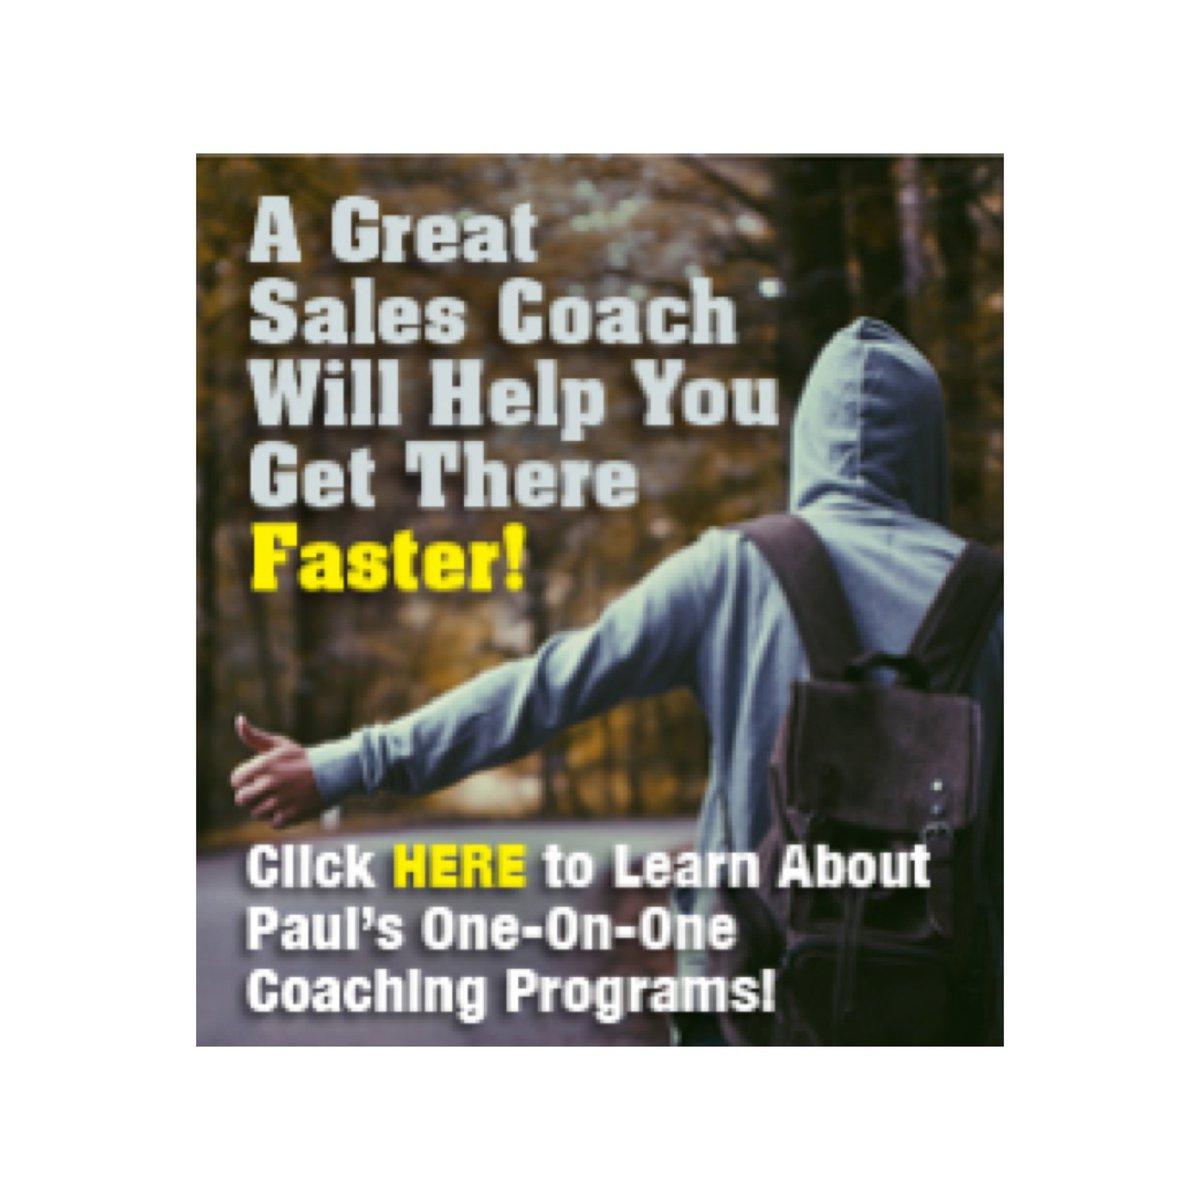 Paul Castain's One On One Coaching Program https://t.co/Hyu49rBWyL https://t.co/GjRDEoHTaV